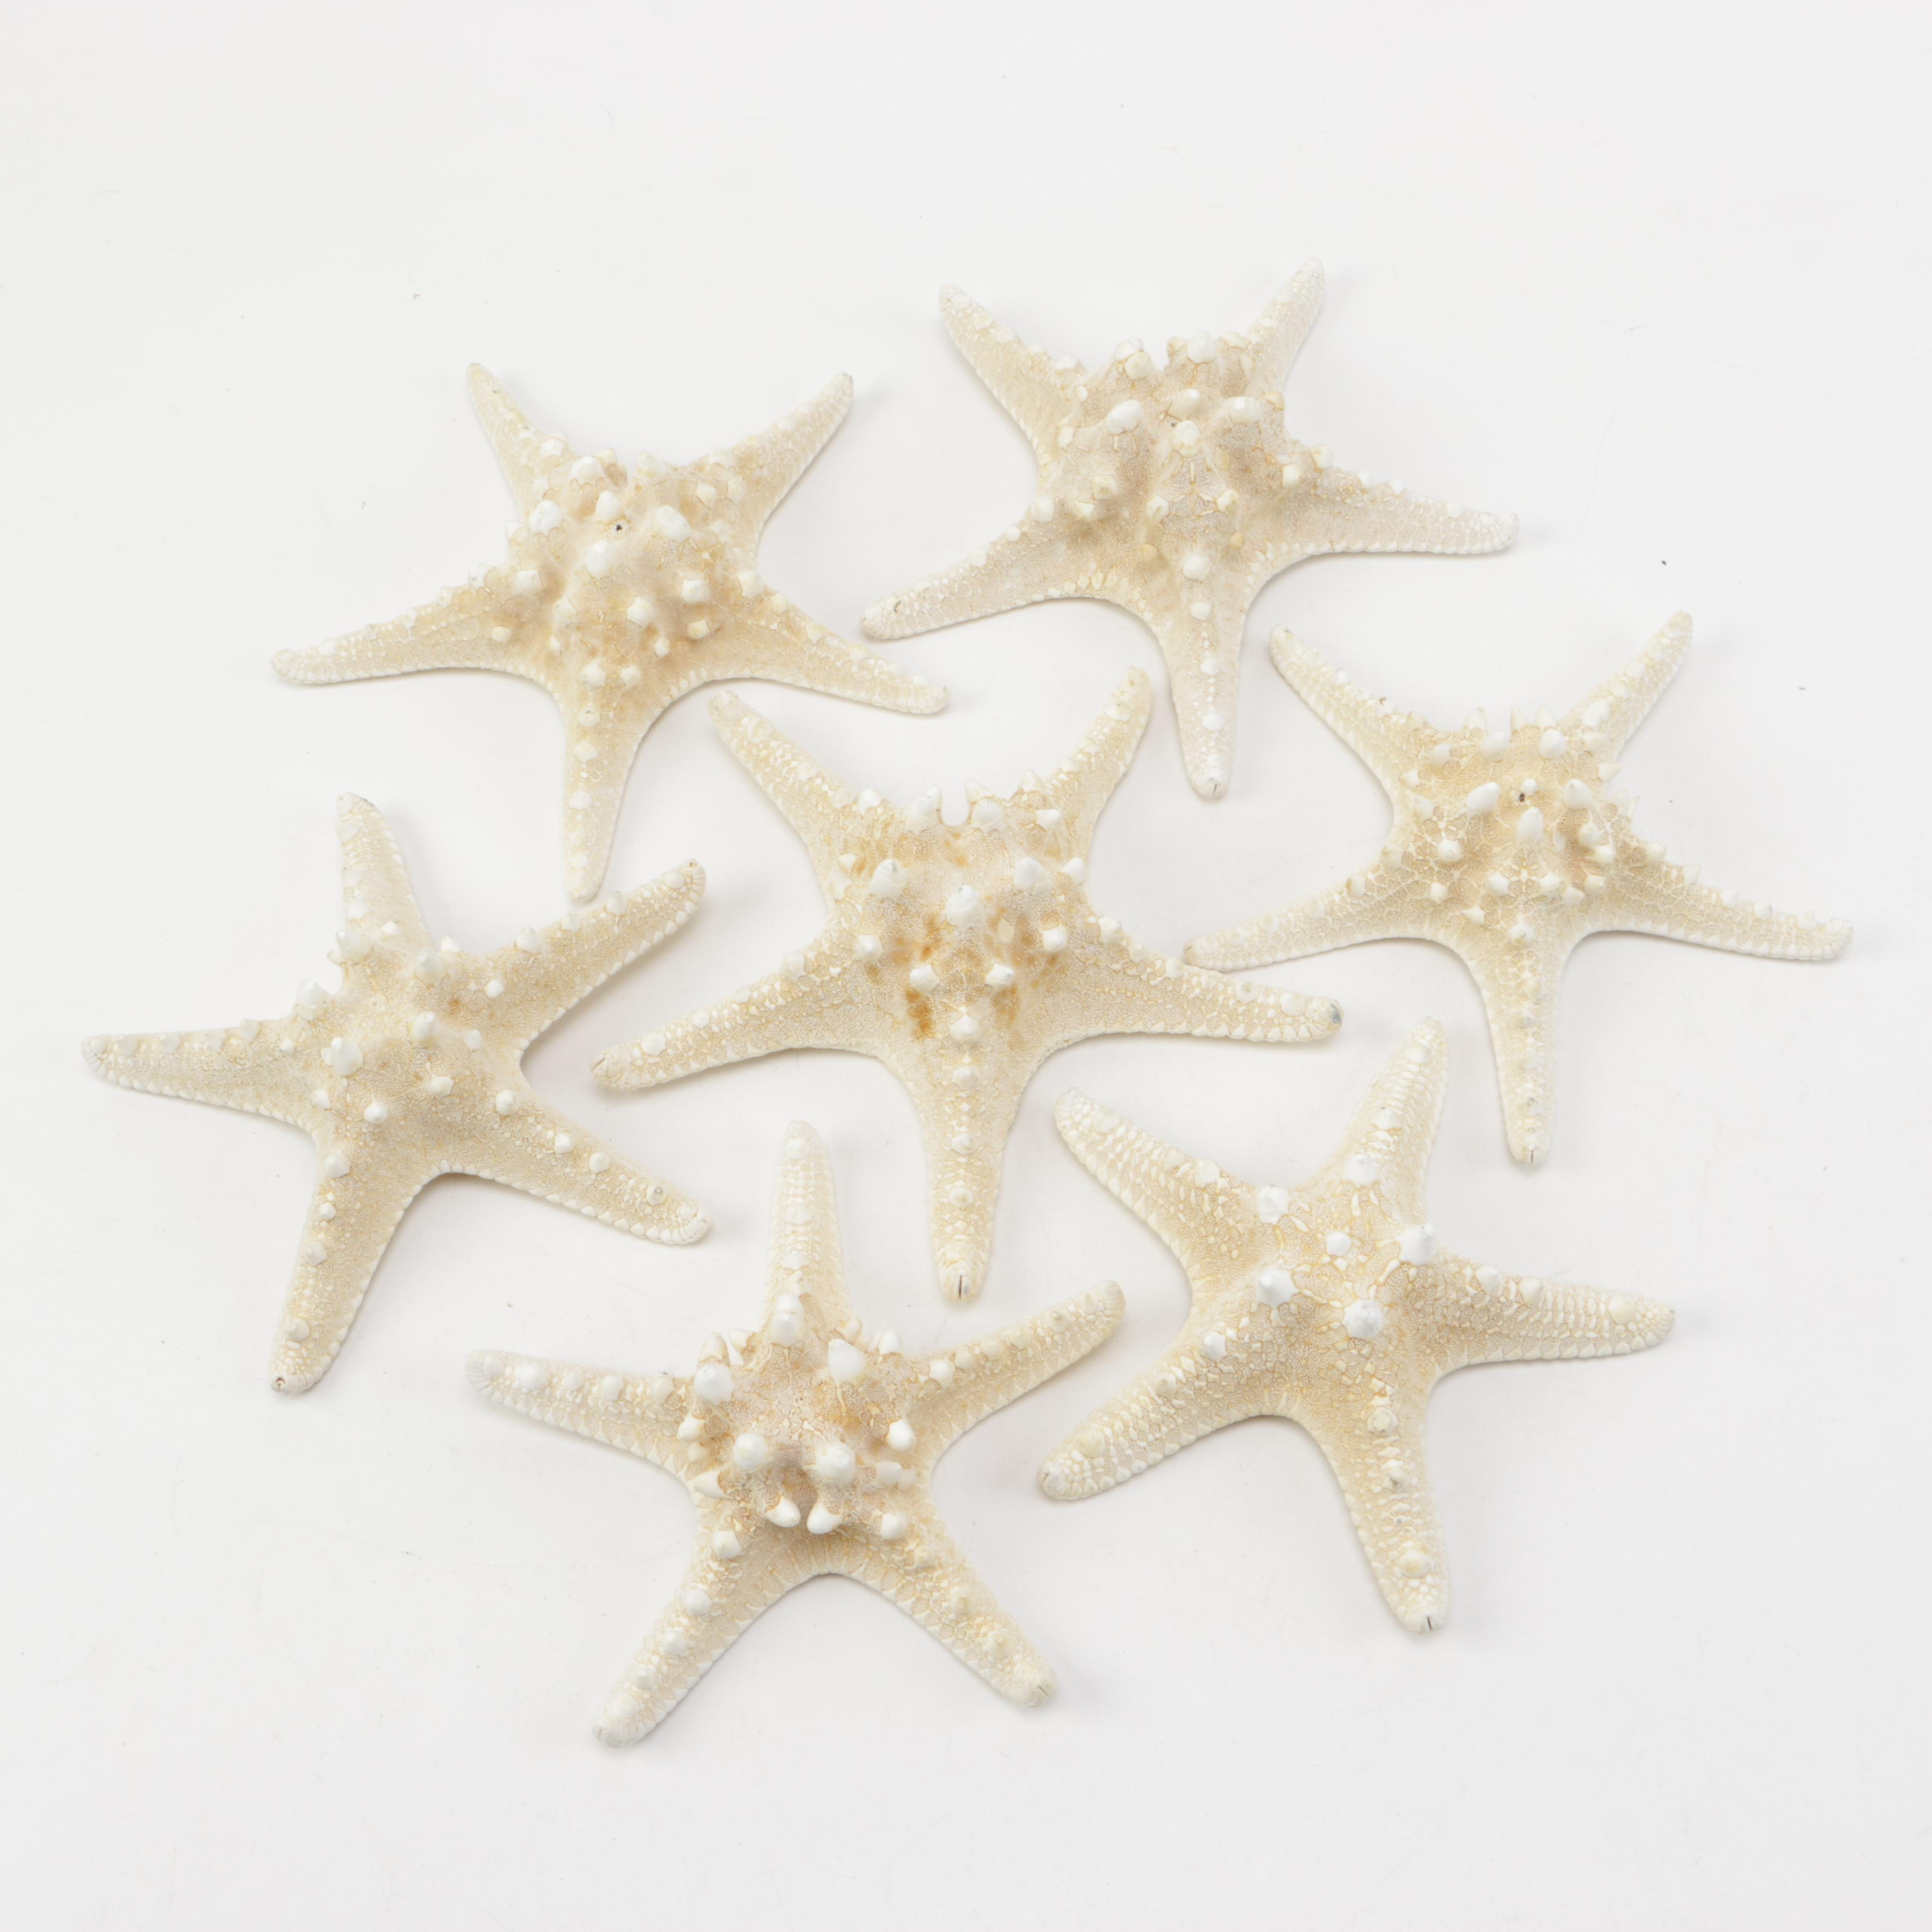 Recent Starfish Specimens